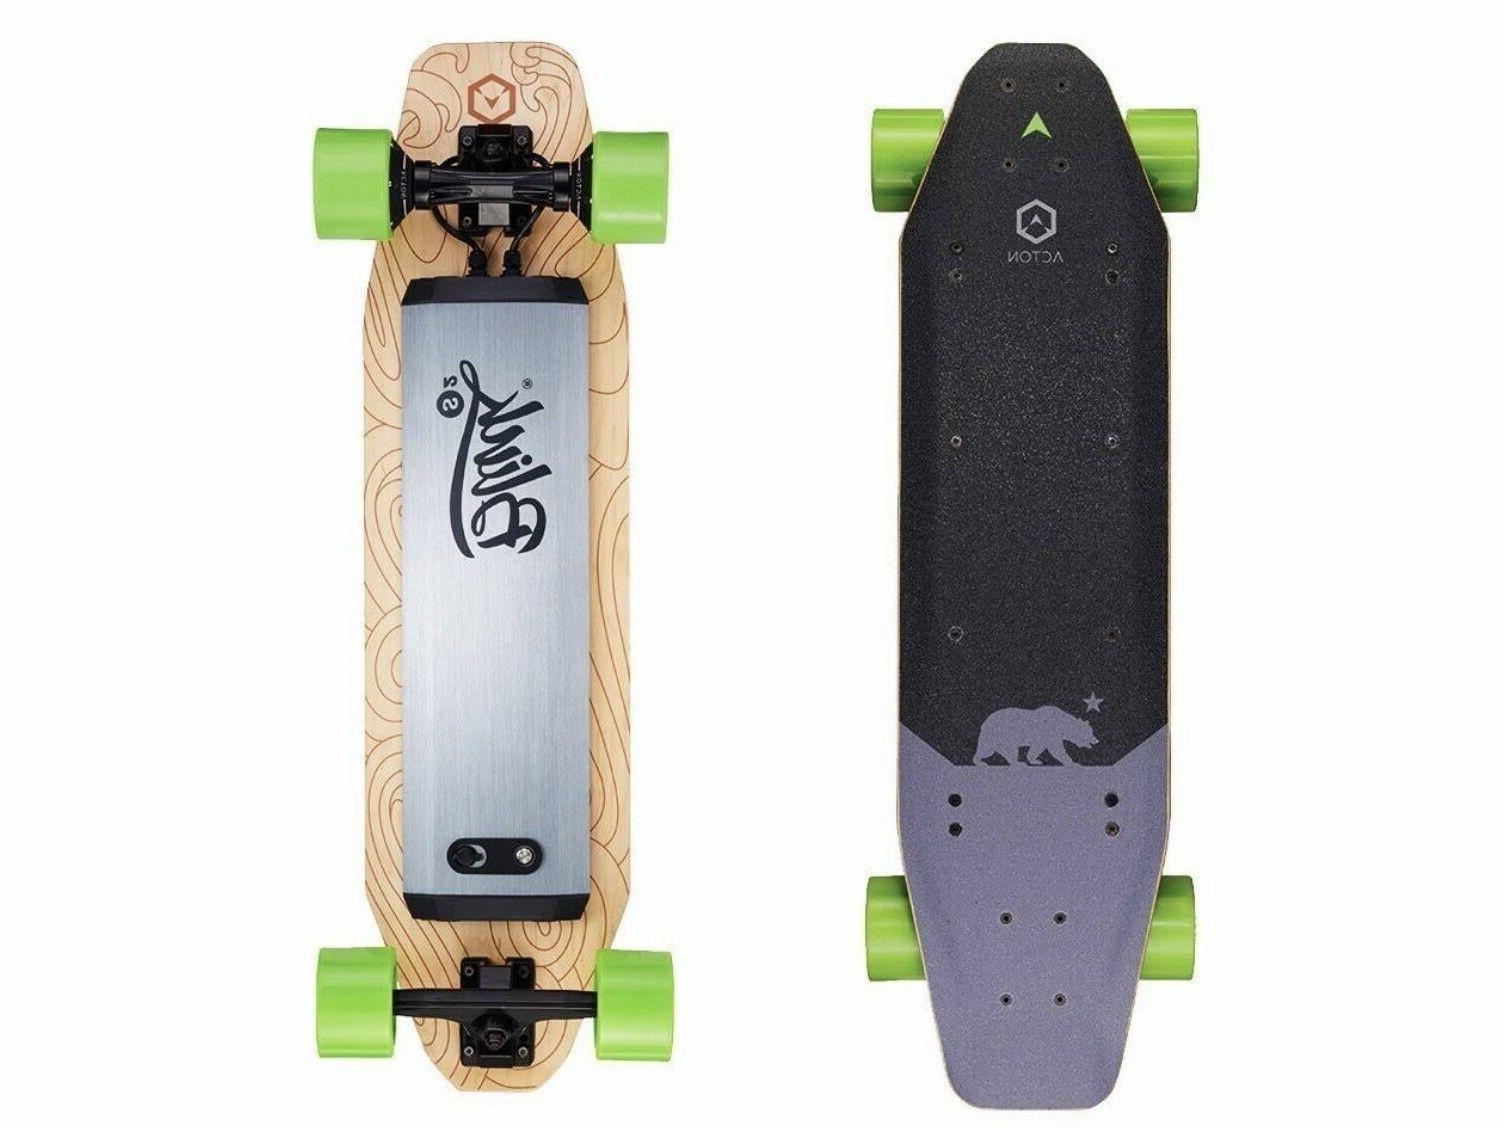 blink s2 electric skateboard 2 wheel drive